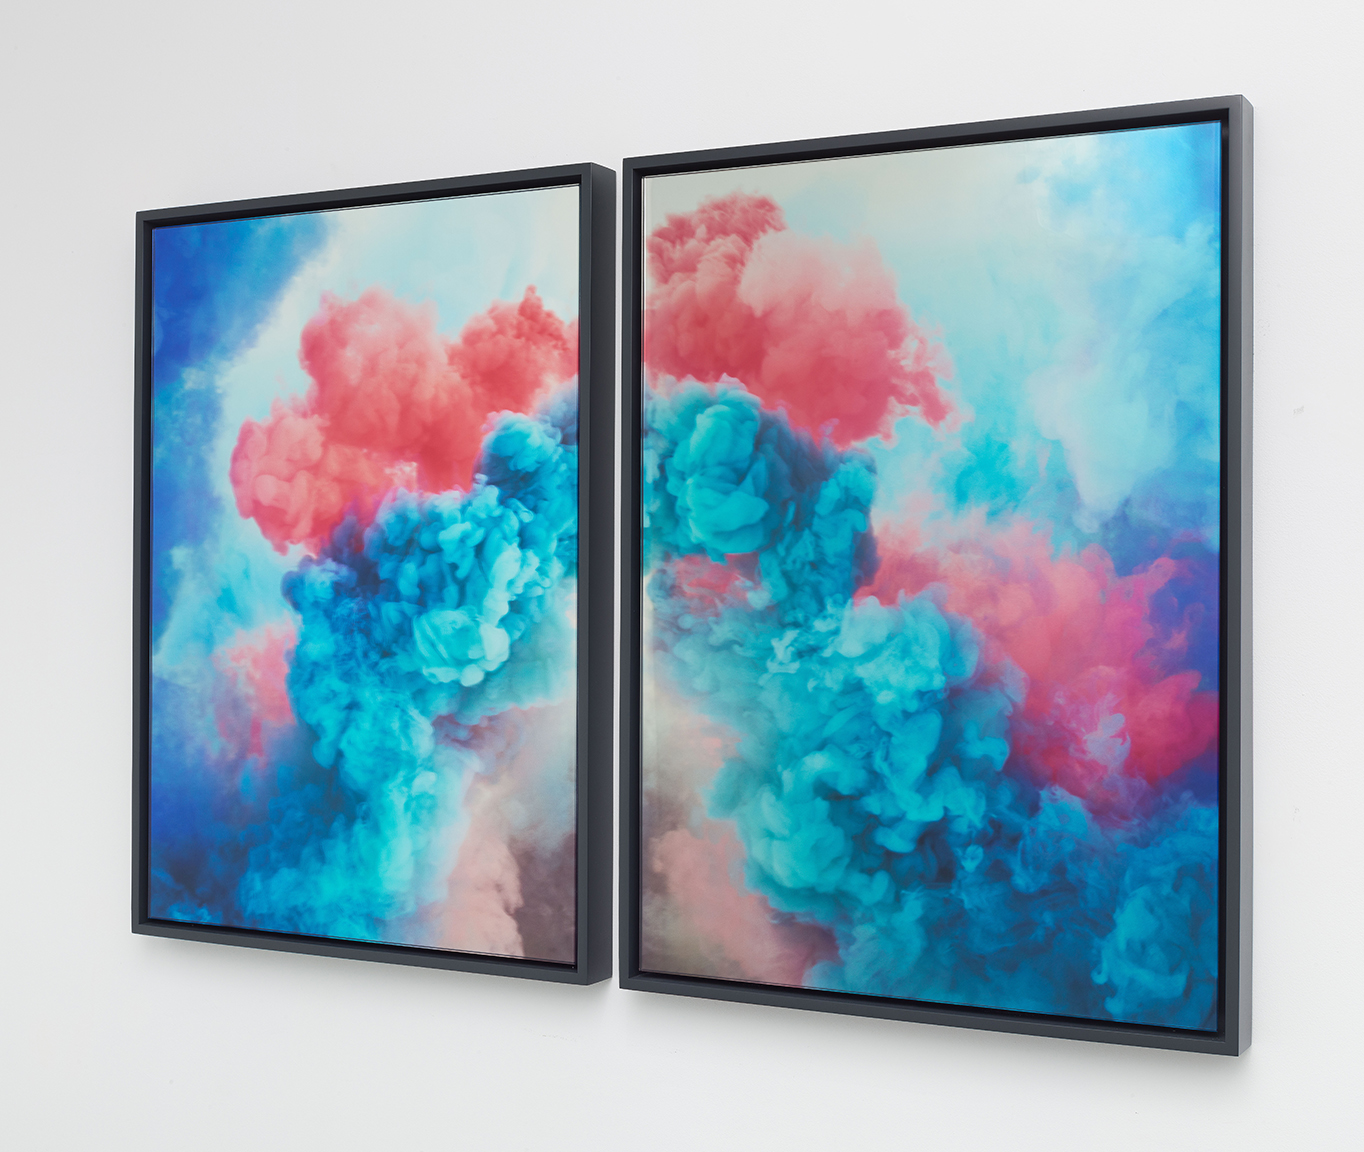 Goldschmied & Chiari, Untitled View, 2017